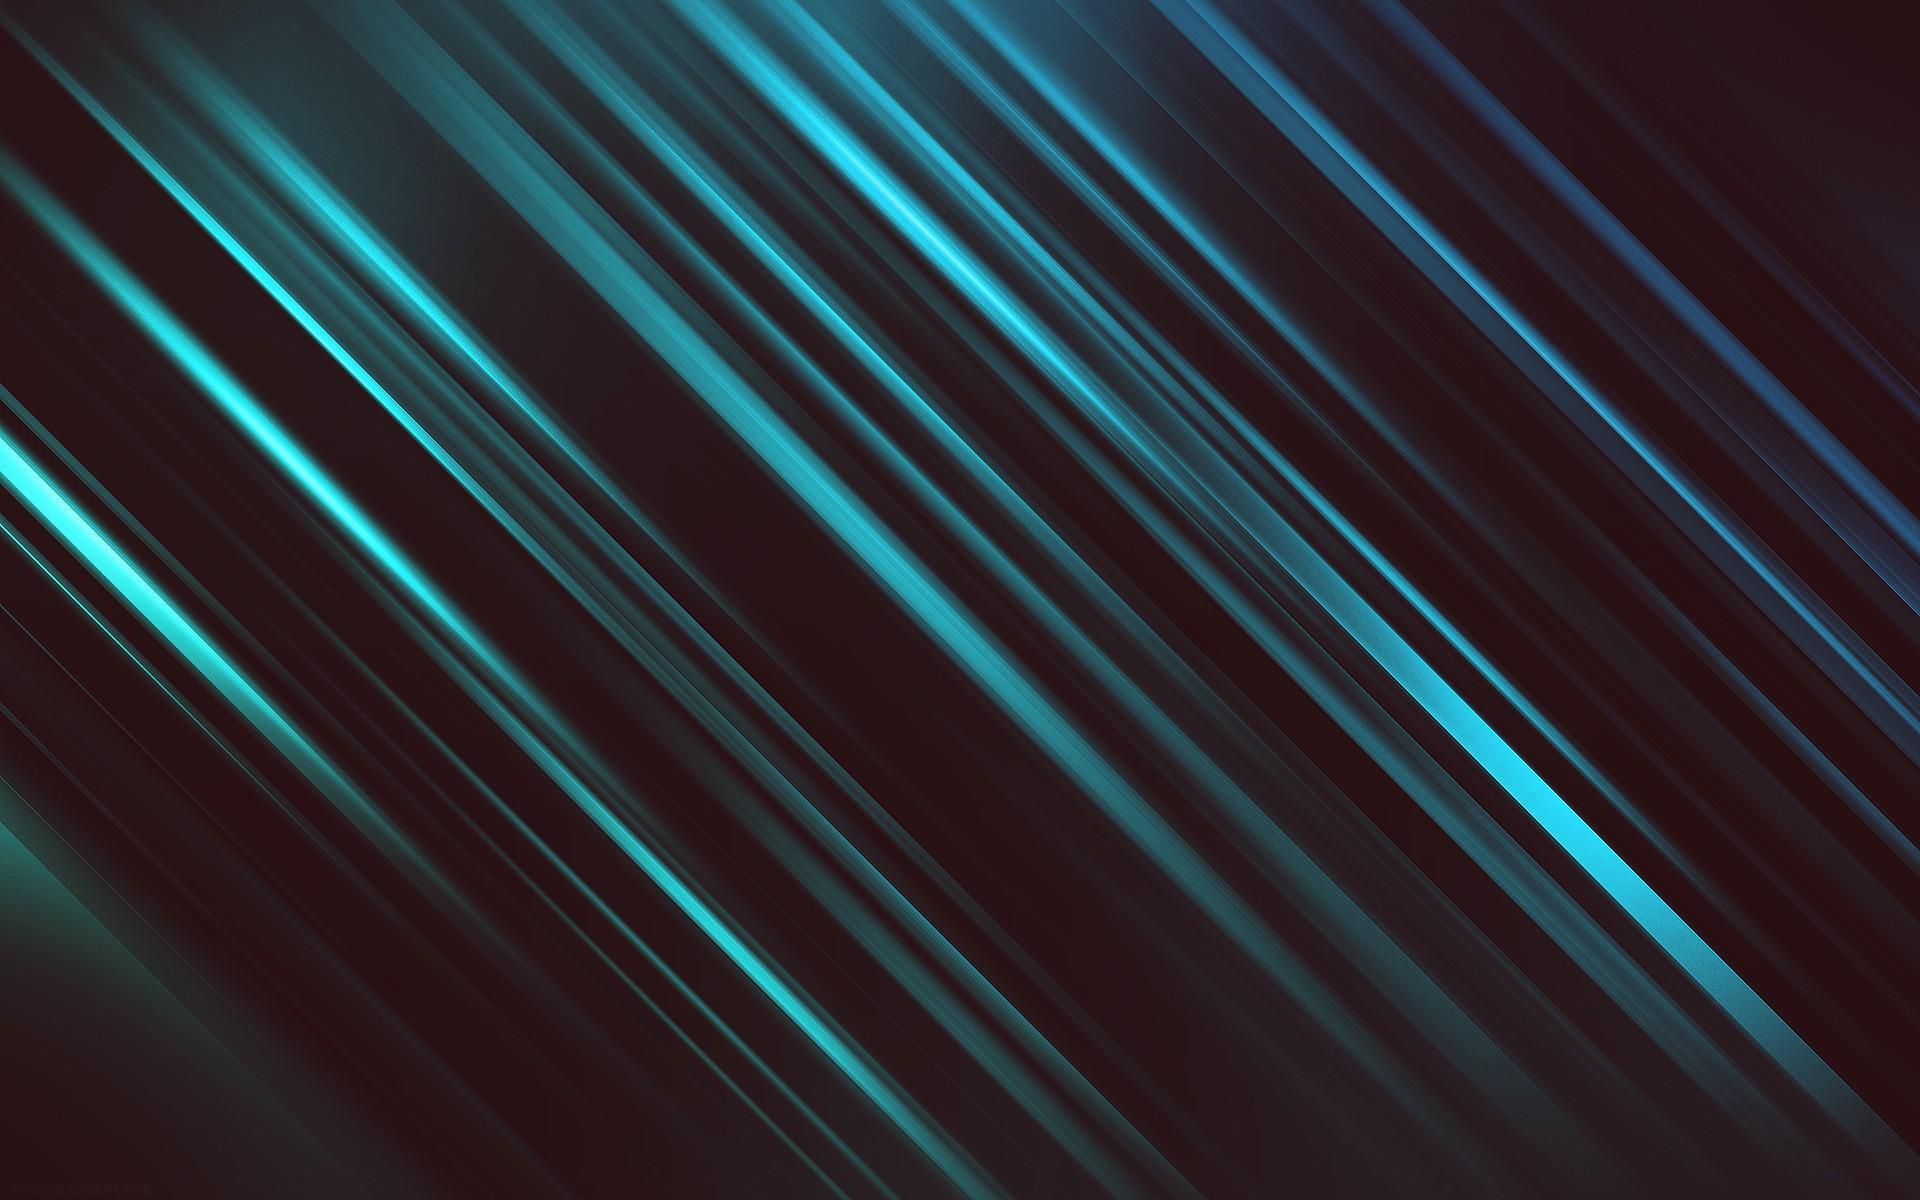 Abstract, Dark, Turquoise, Artwork, Digital Art Wallpapers